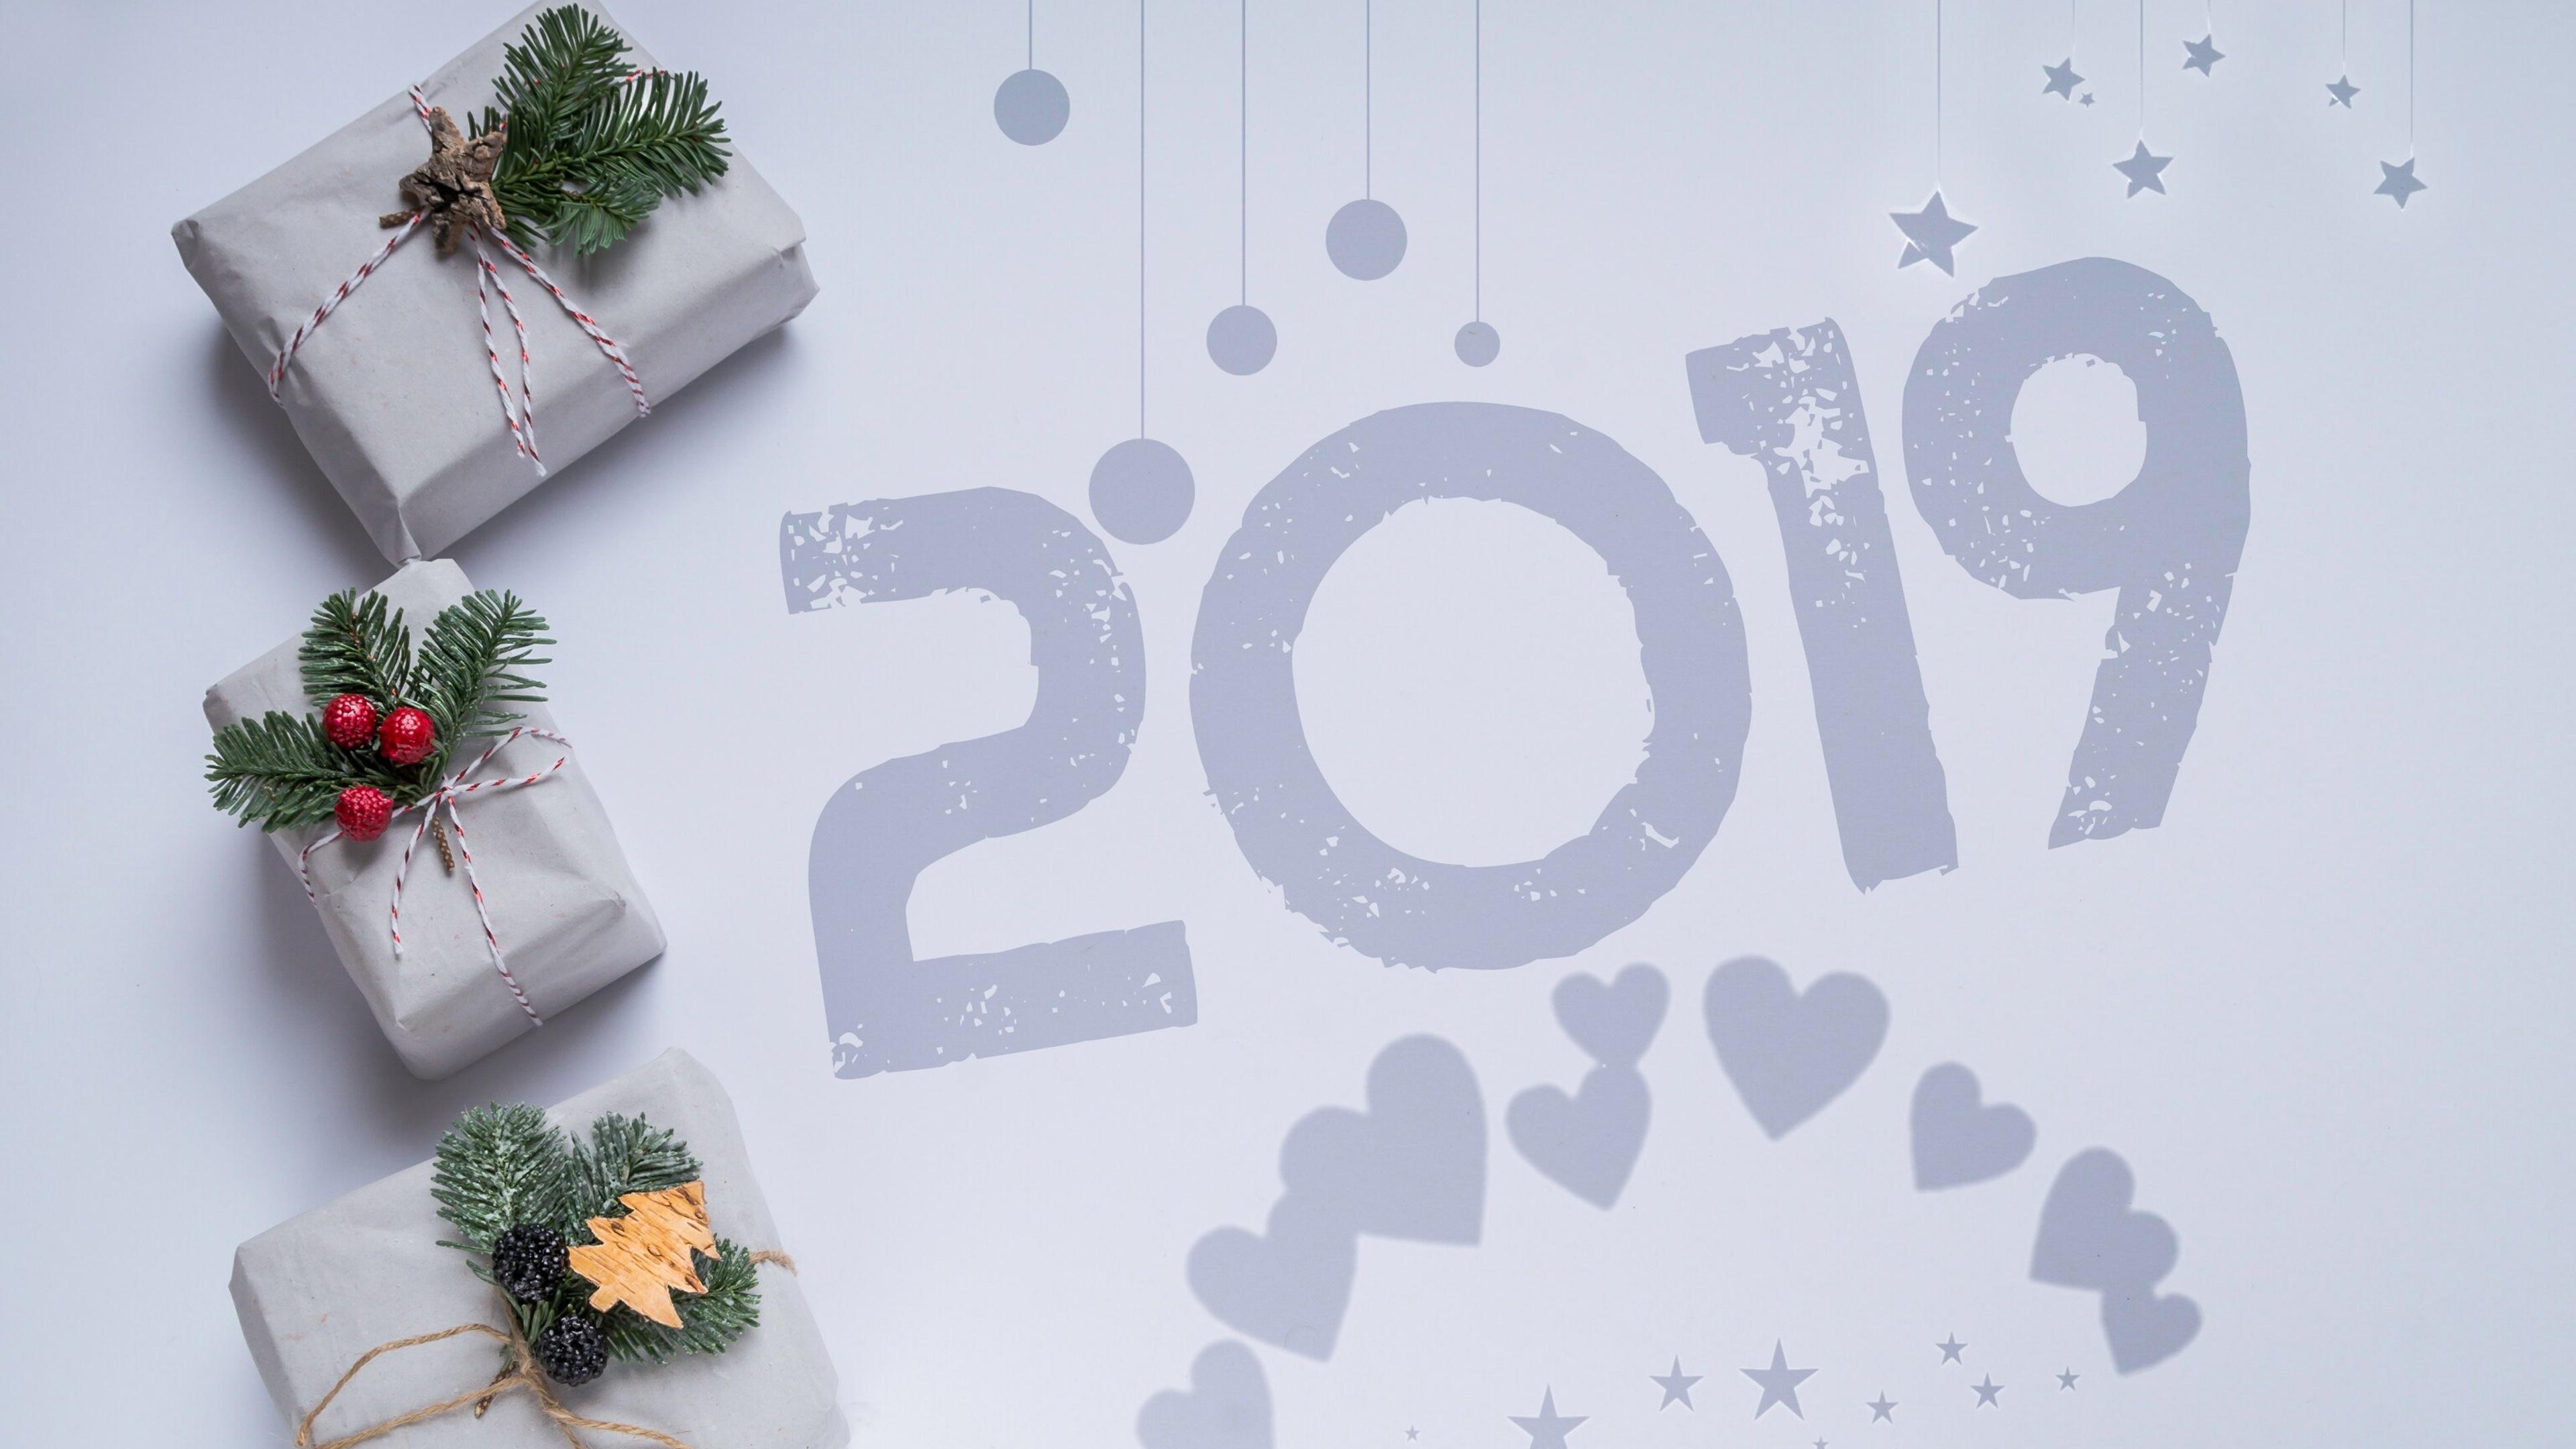 4K Christmas Presents New Year 2019 Kado Winter Wallpaper 38451 3840x2160